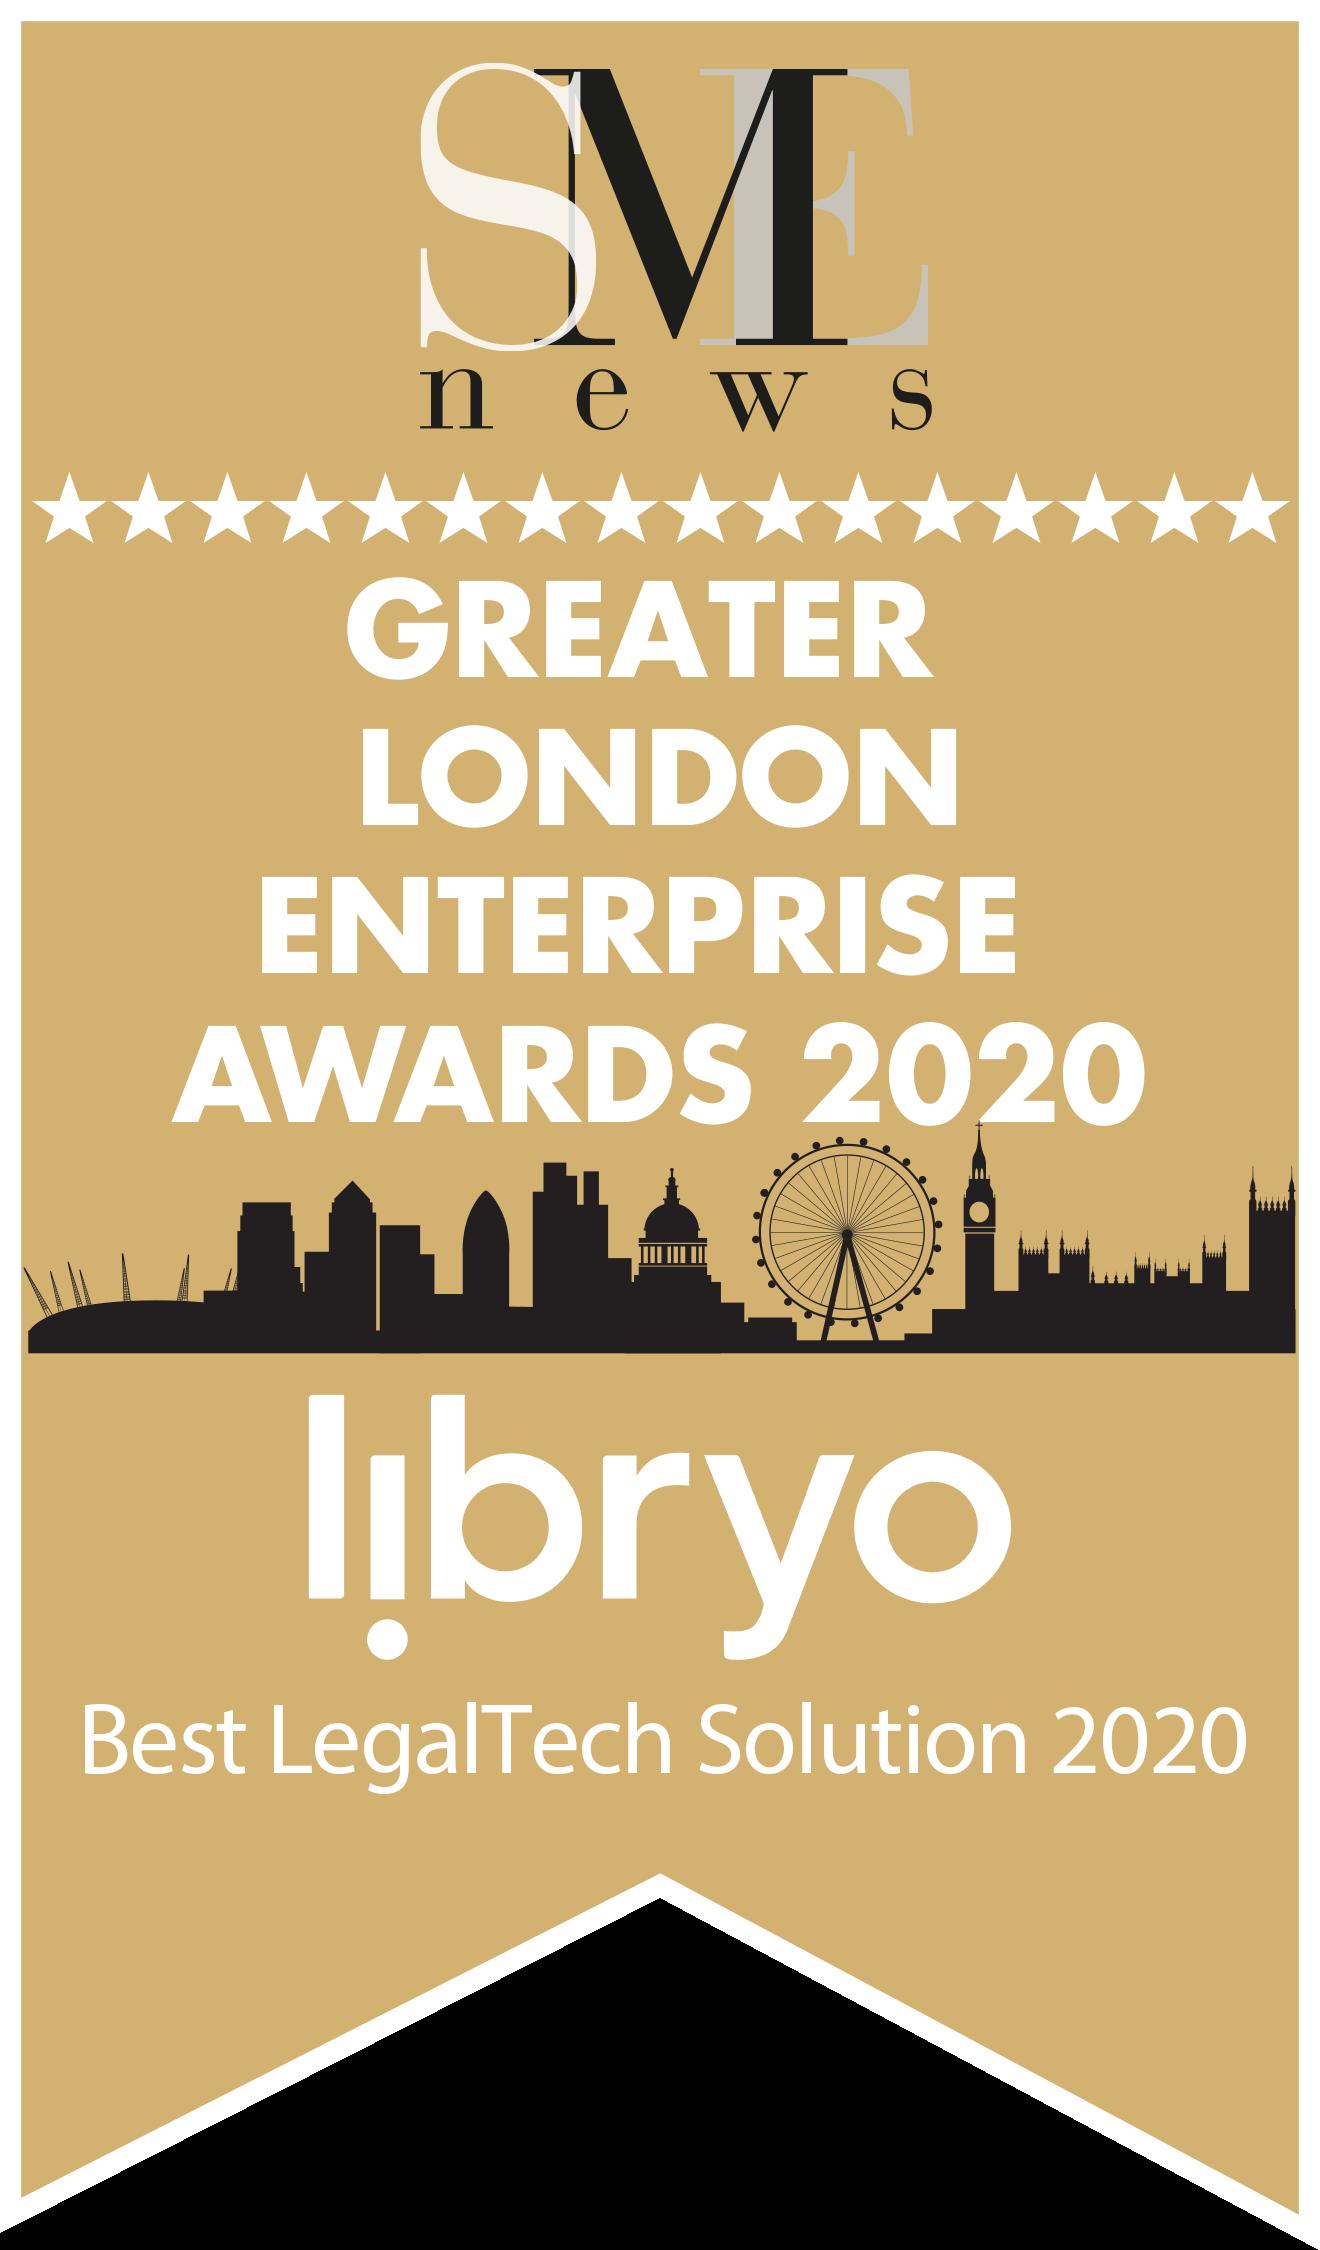 Sep20587-SME Greater London Enterprise Awards 2020 Winners Logo (1)